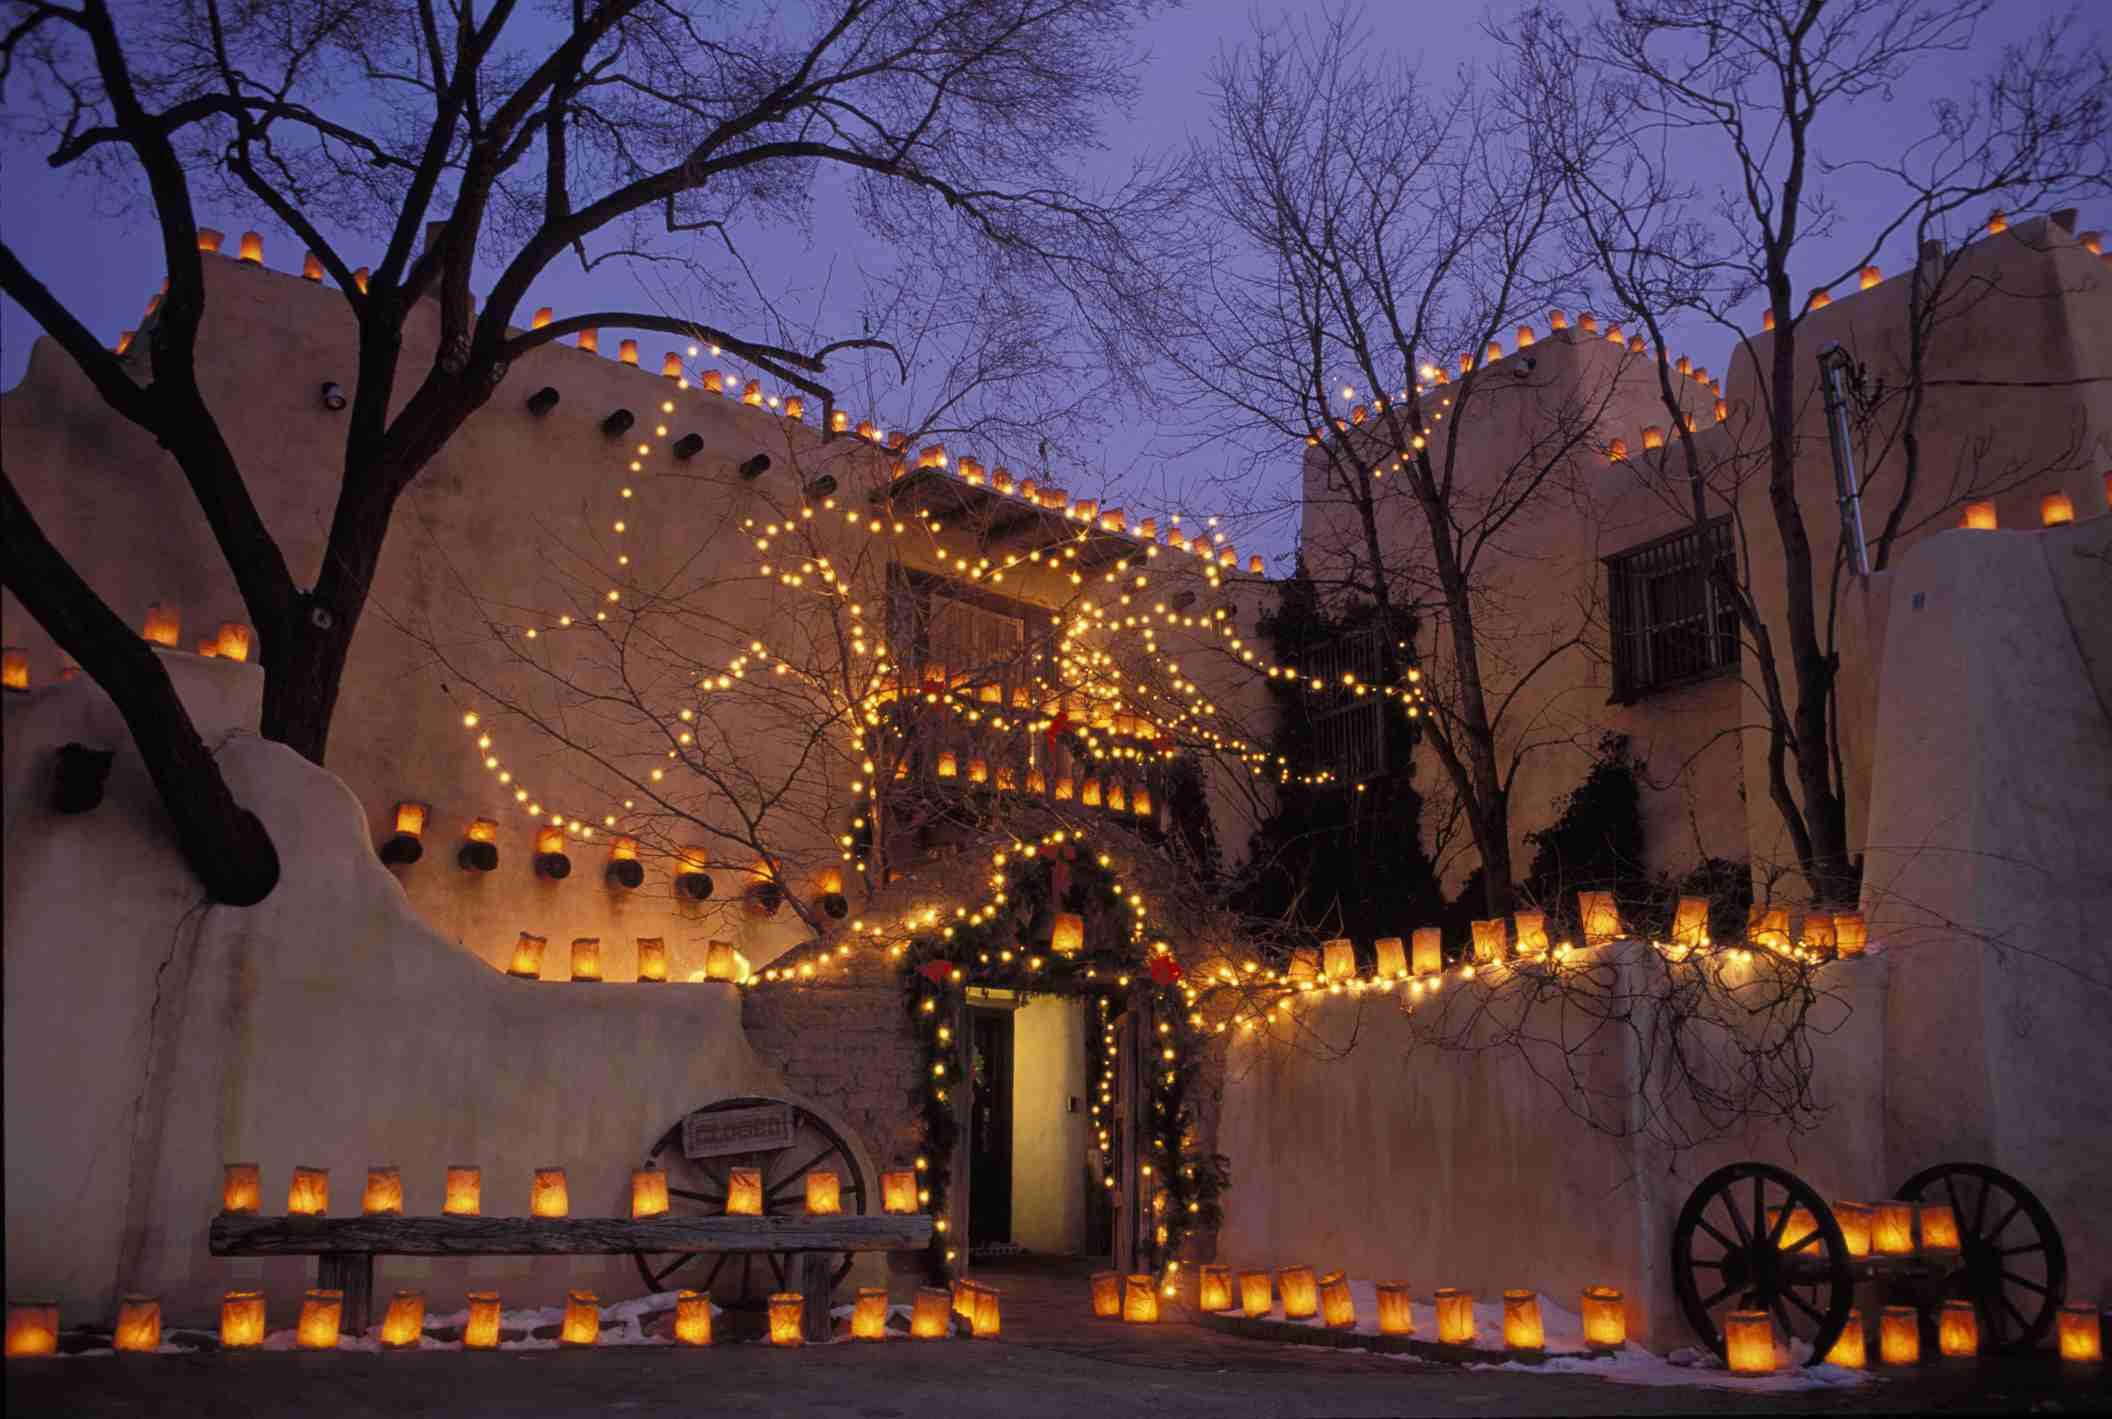 New Mexico, Santa Fe, Fenn Gallery With Farolito Lights For Christmas